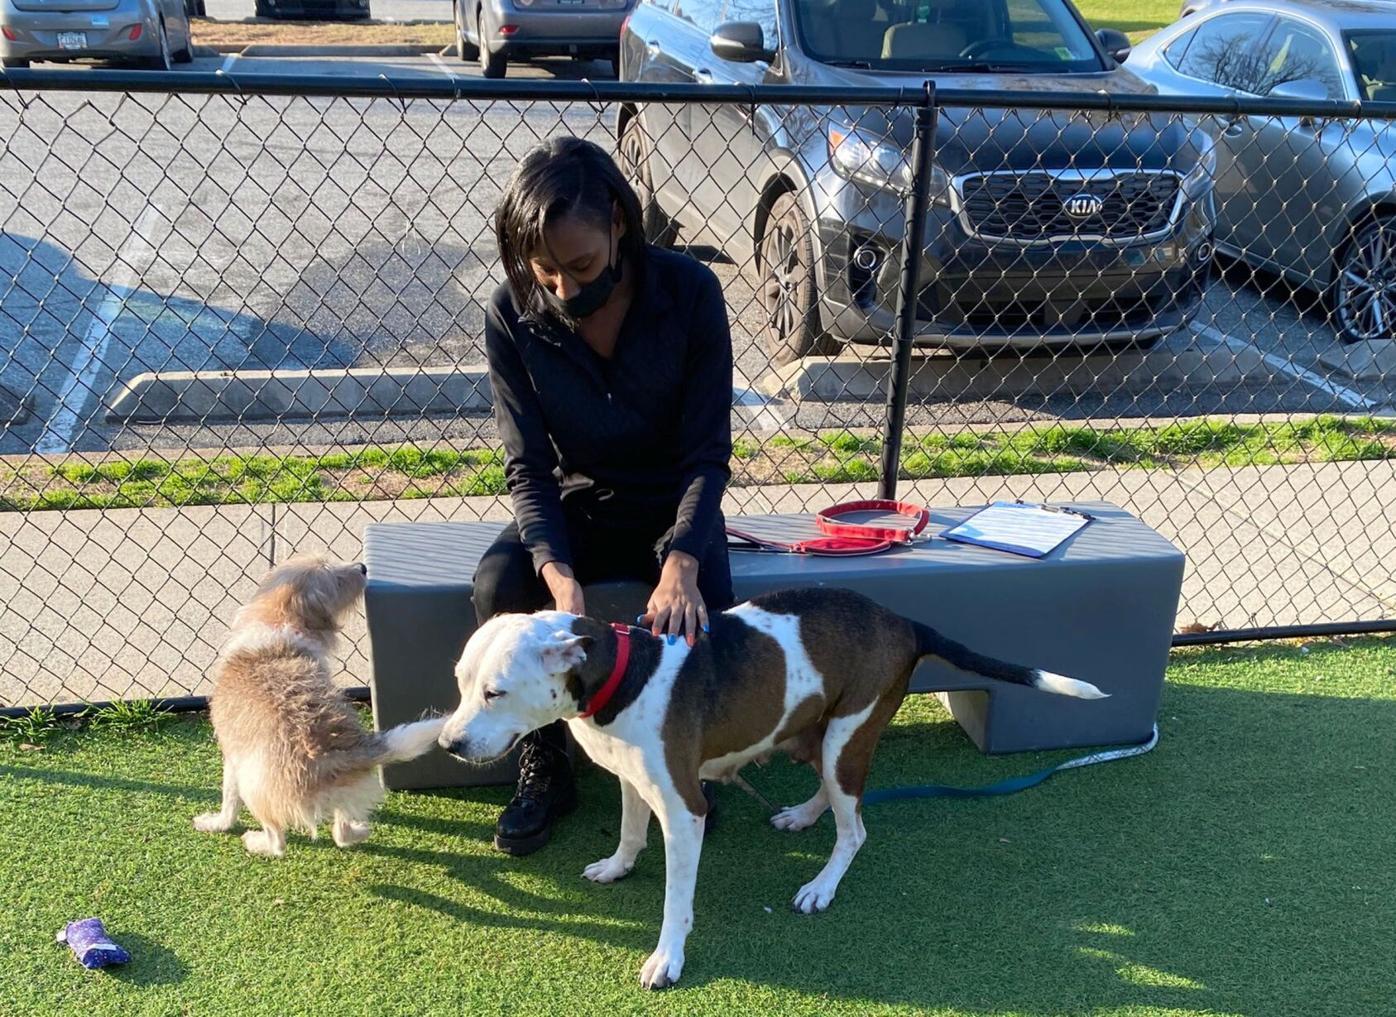 032421_MNS_LifeLine_fostering_001 LaShondria with dogs